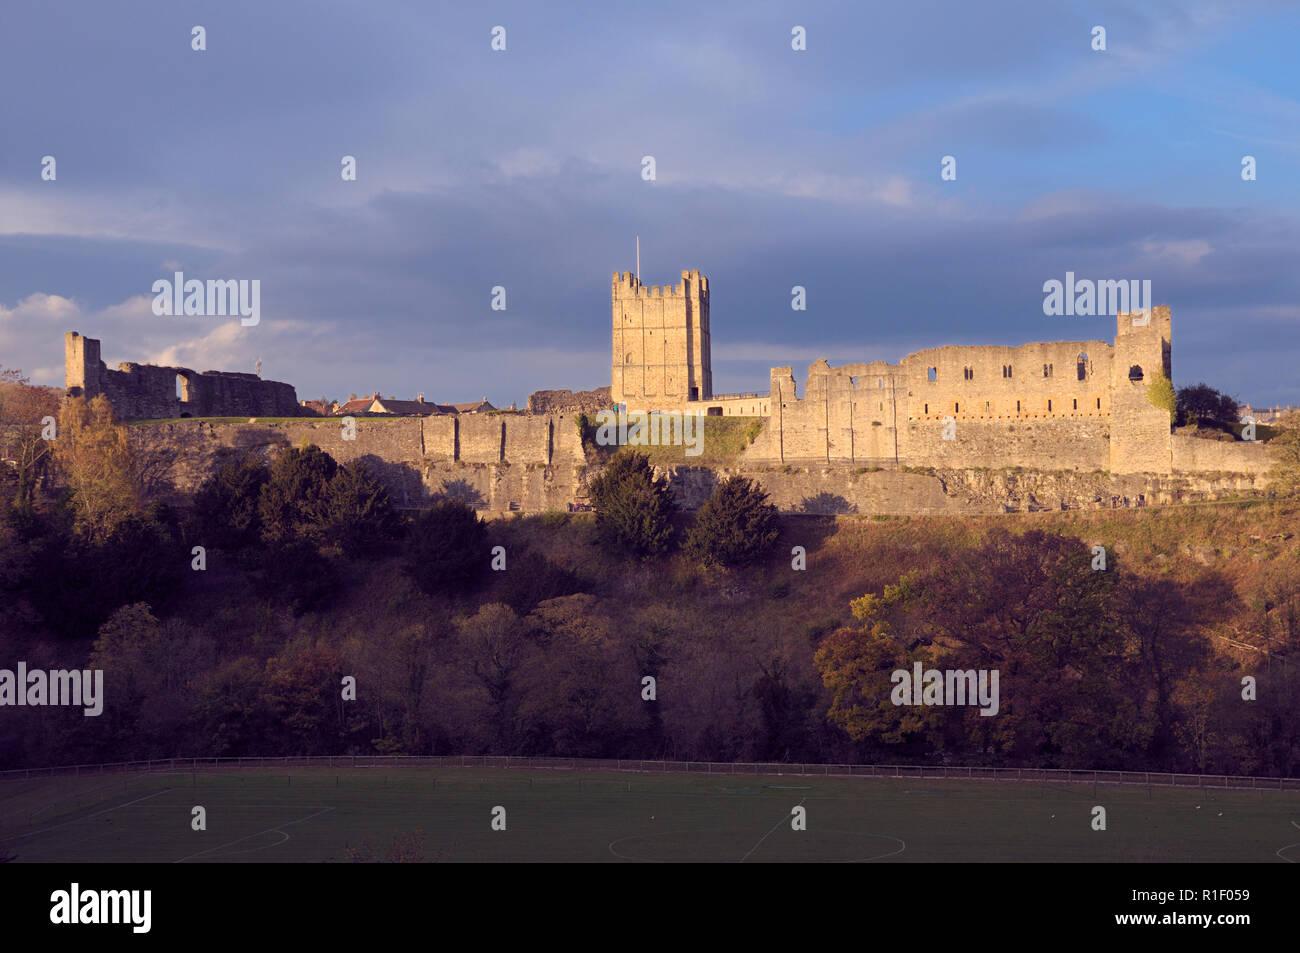 Richmond Castle, North Yorkshire, England, UK - Stock Image